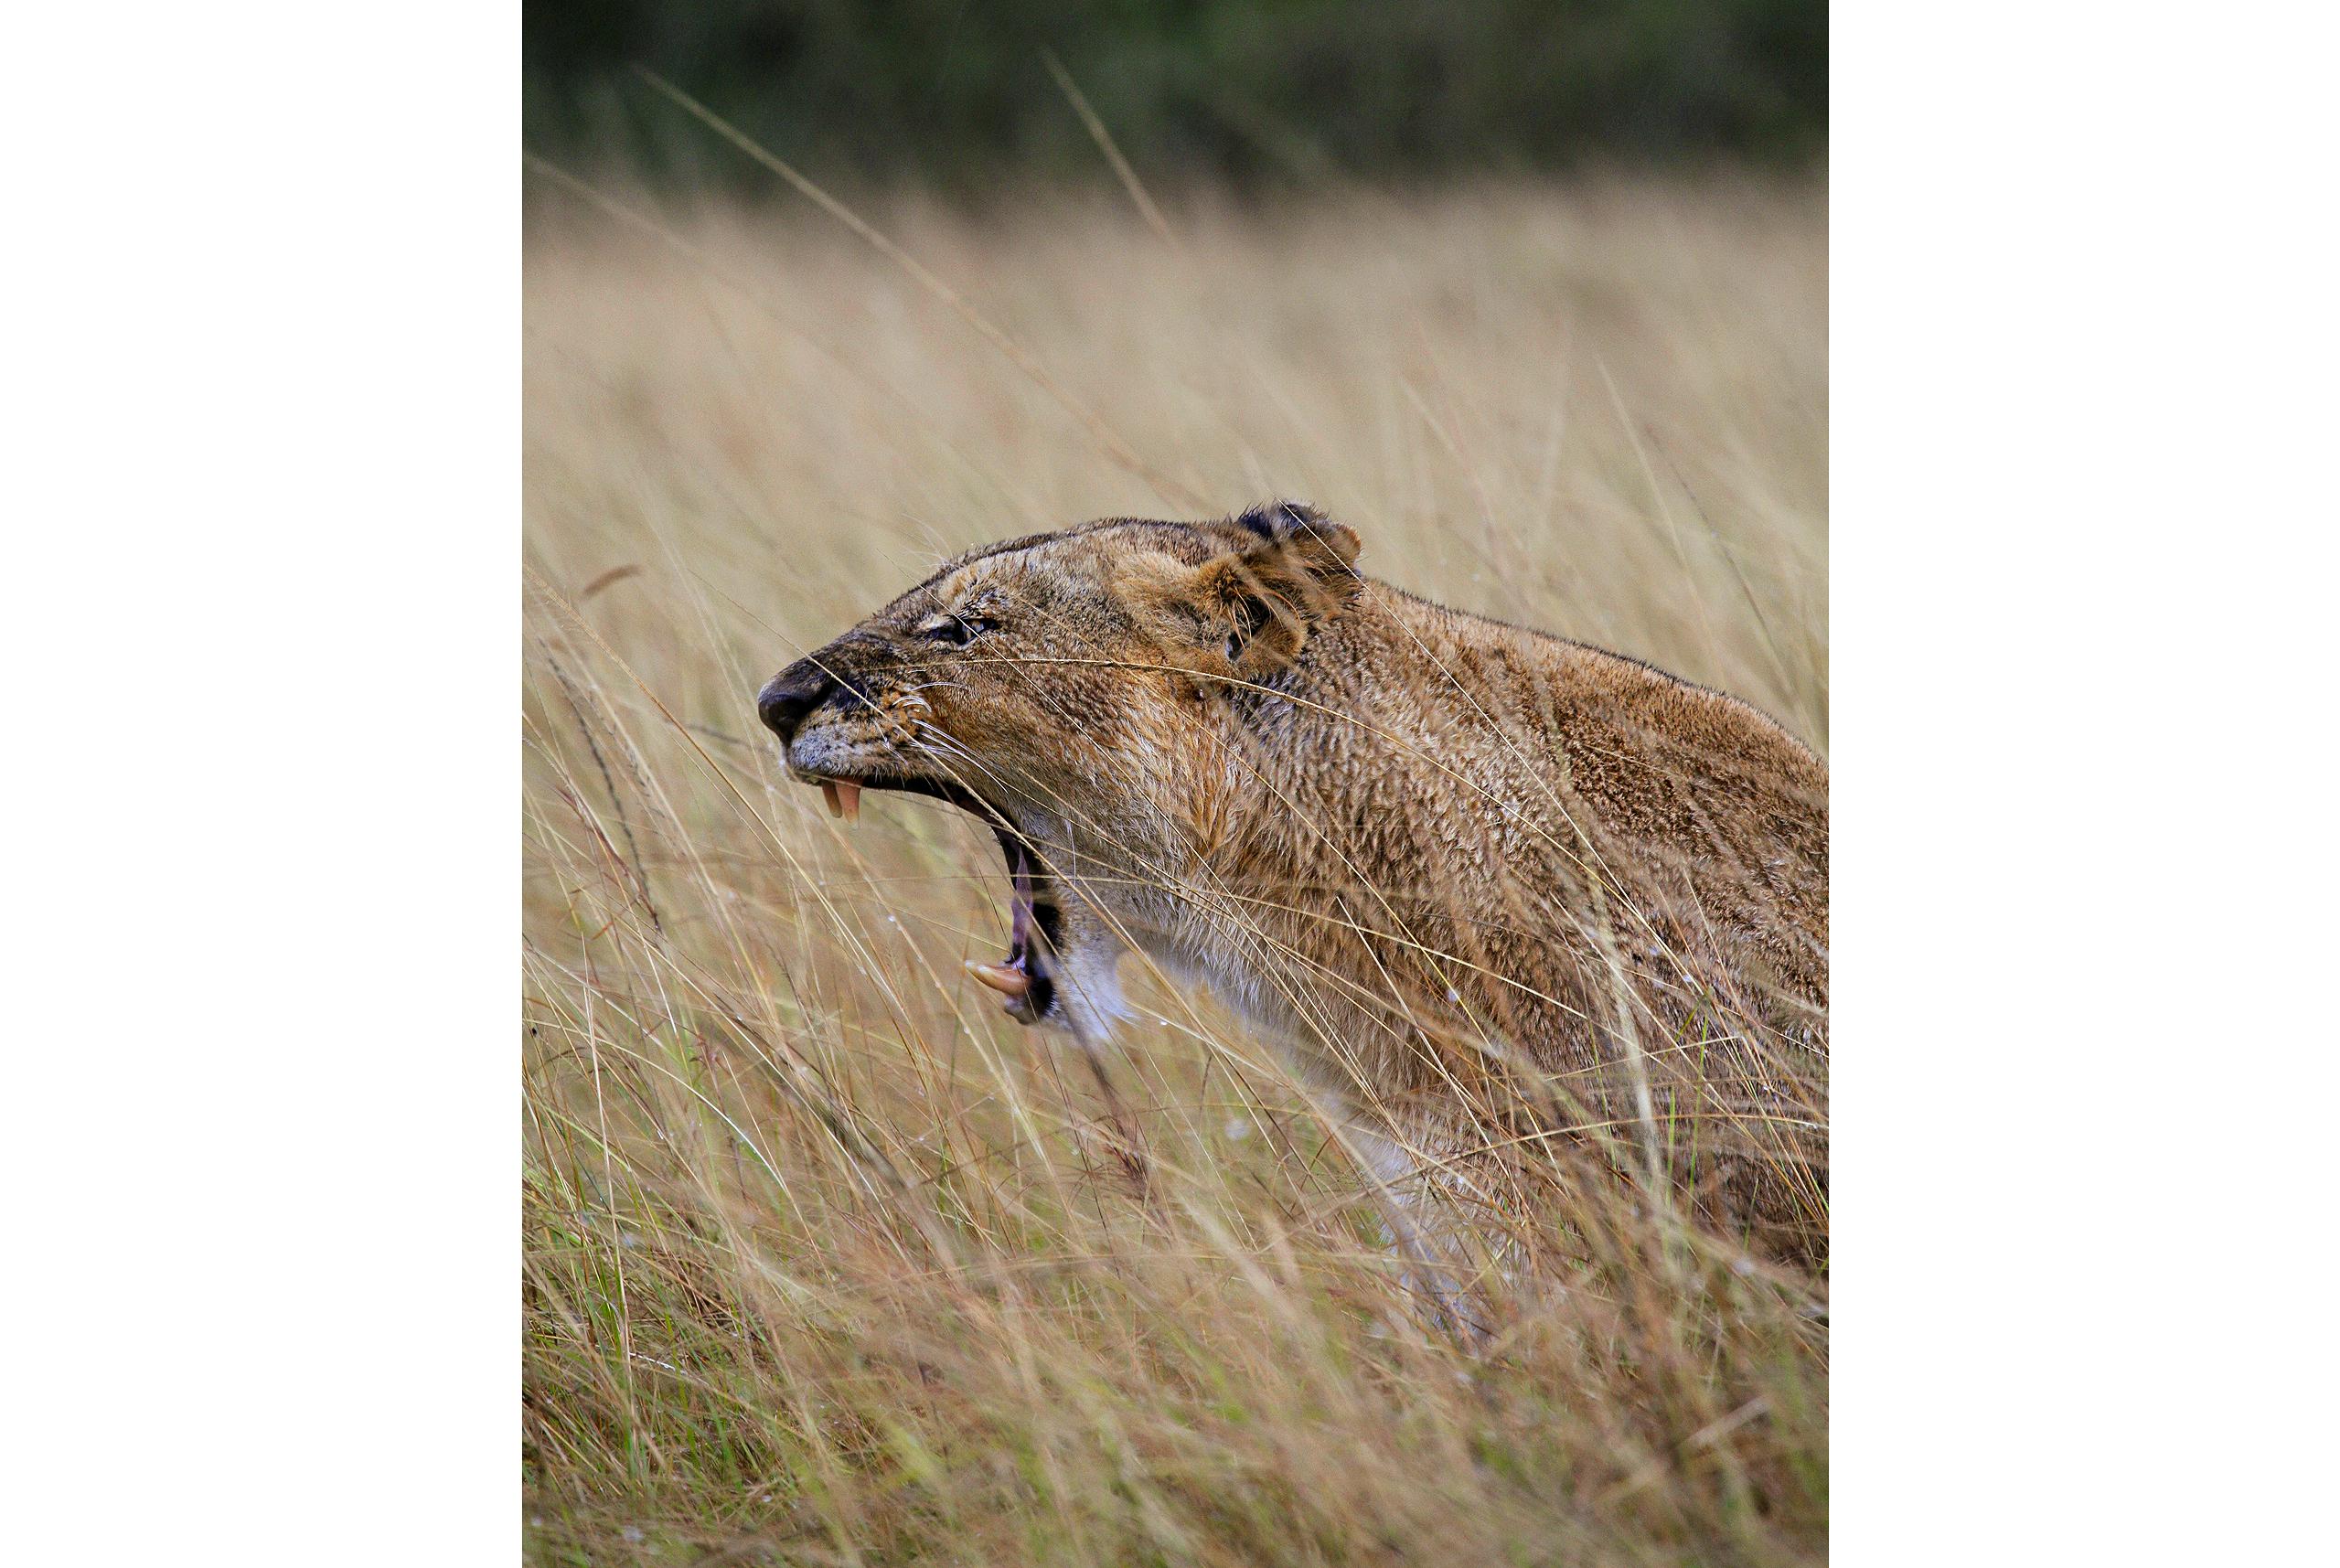 roaring_rain_lions_masai_mara_photo_by_flavio_oliva_16